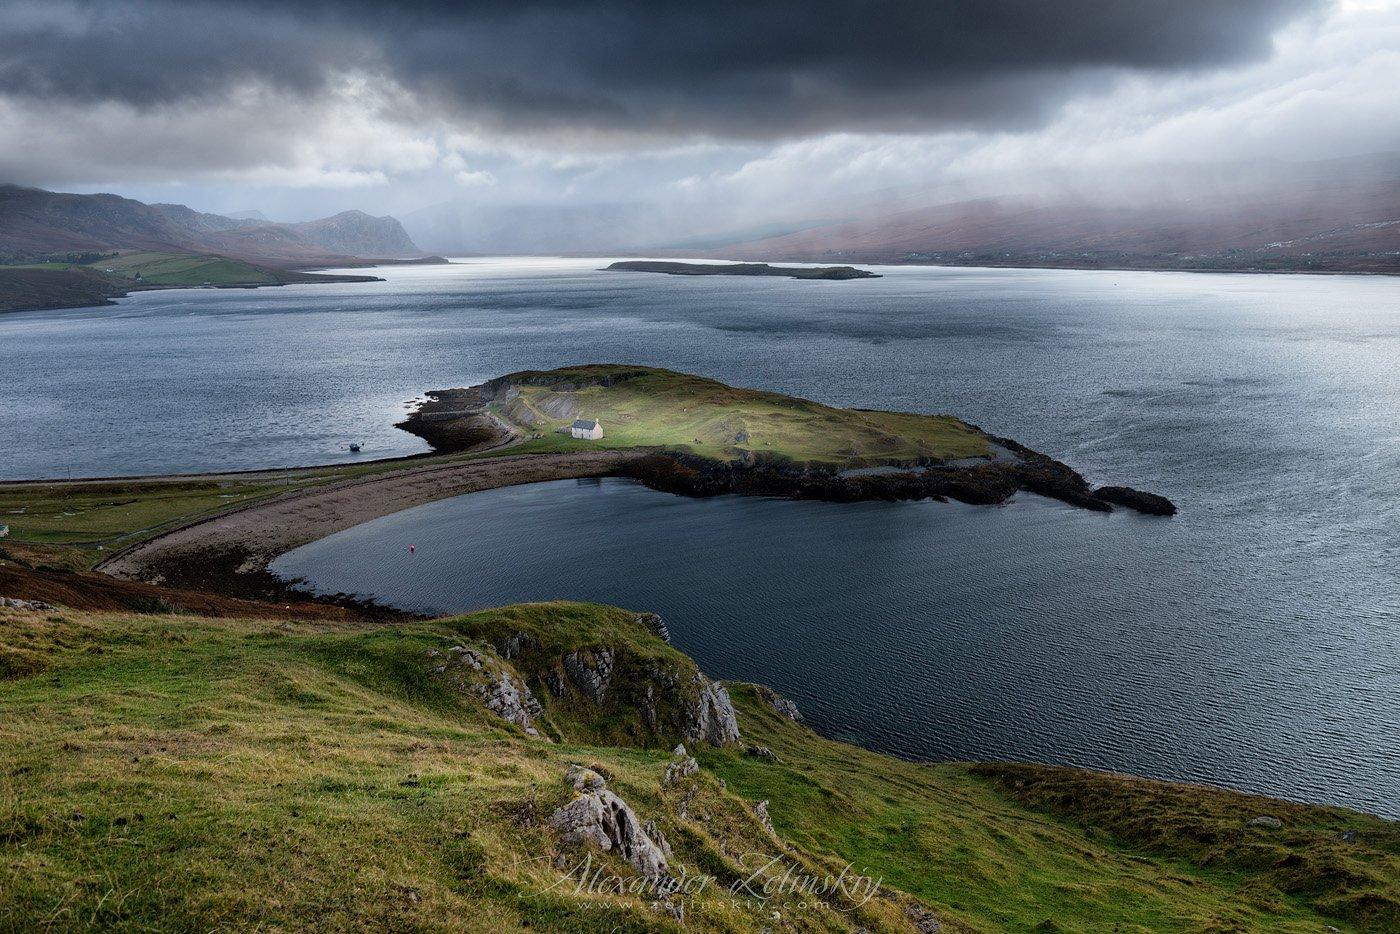 Loch Erribell, шотландия, Alex Mimo